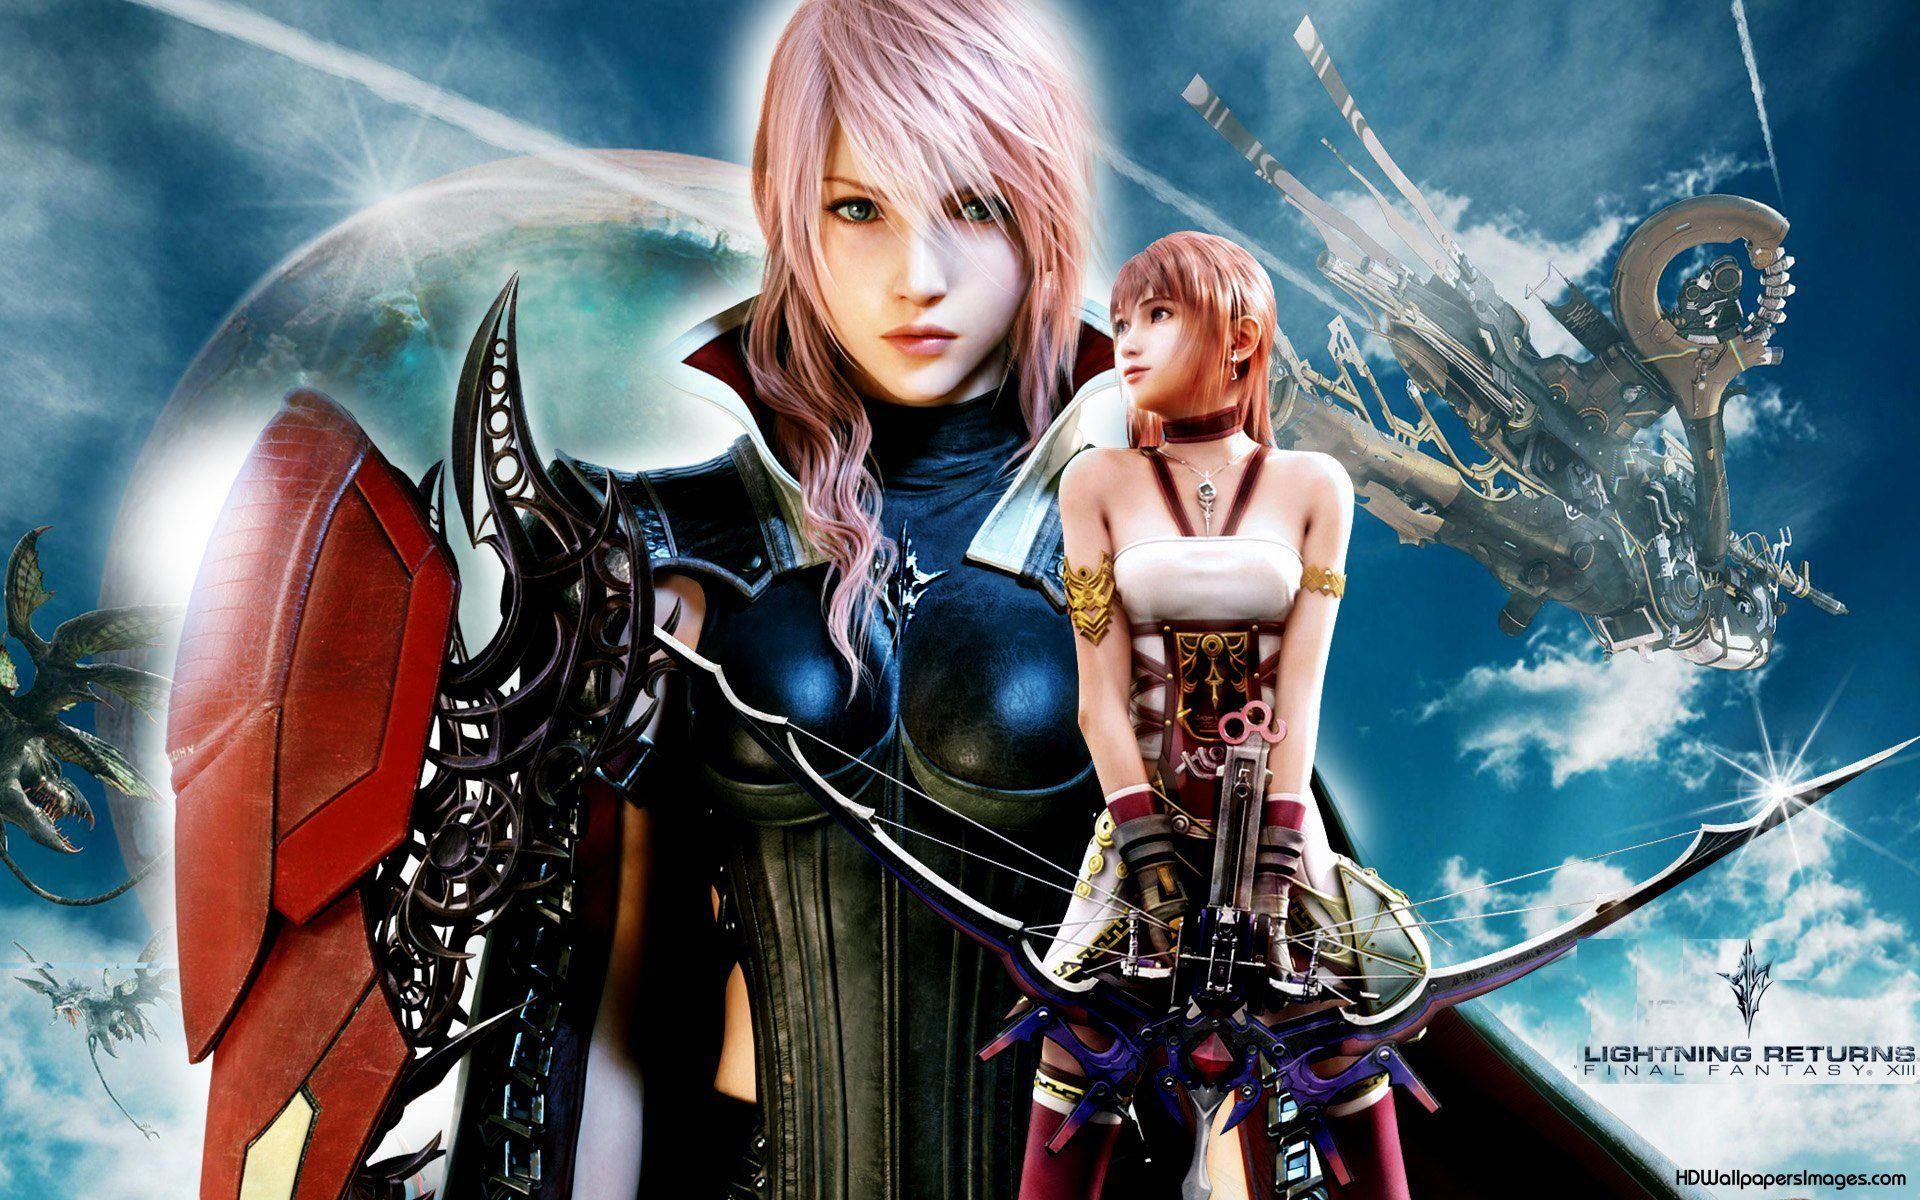 Lightning Returns Final Fantasy XIII Wallpaper Game